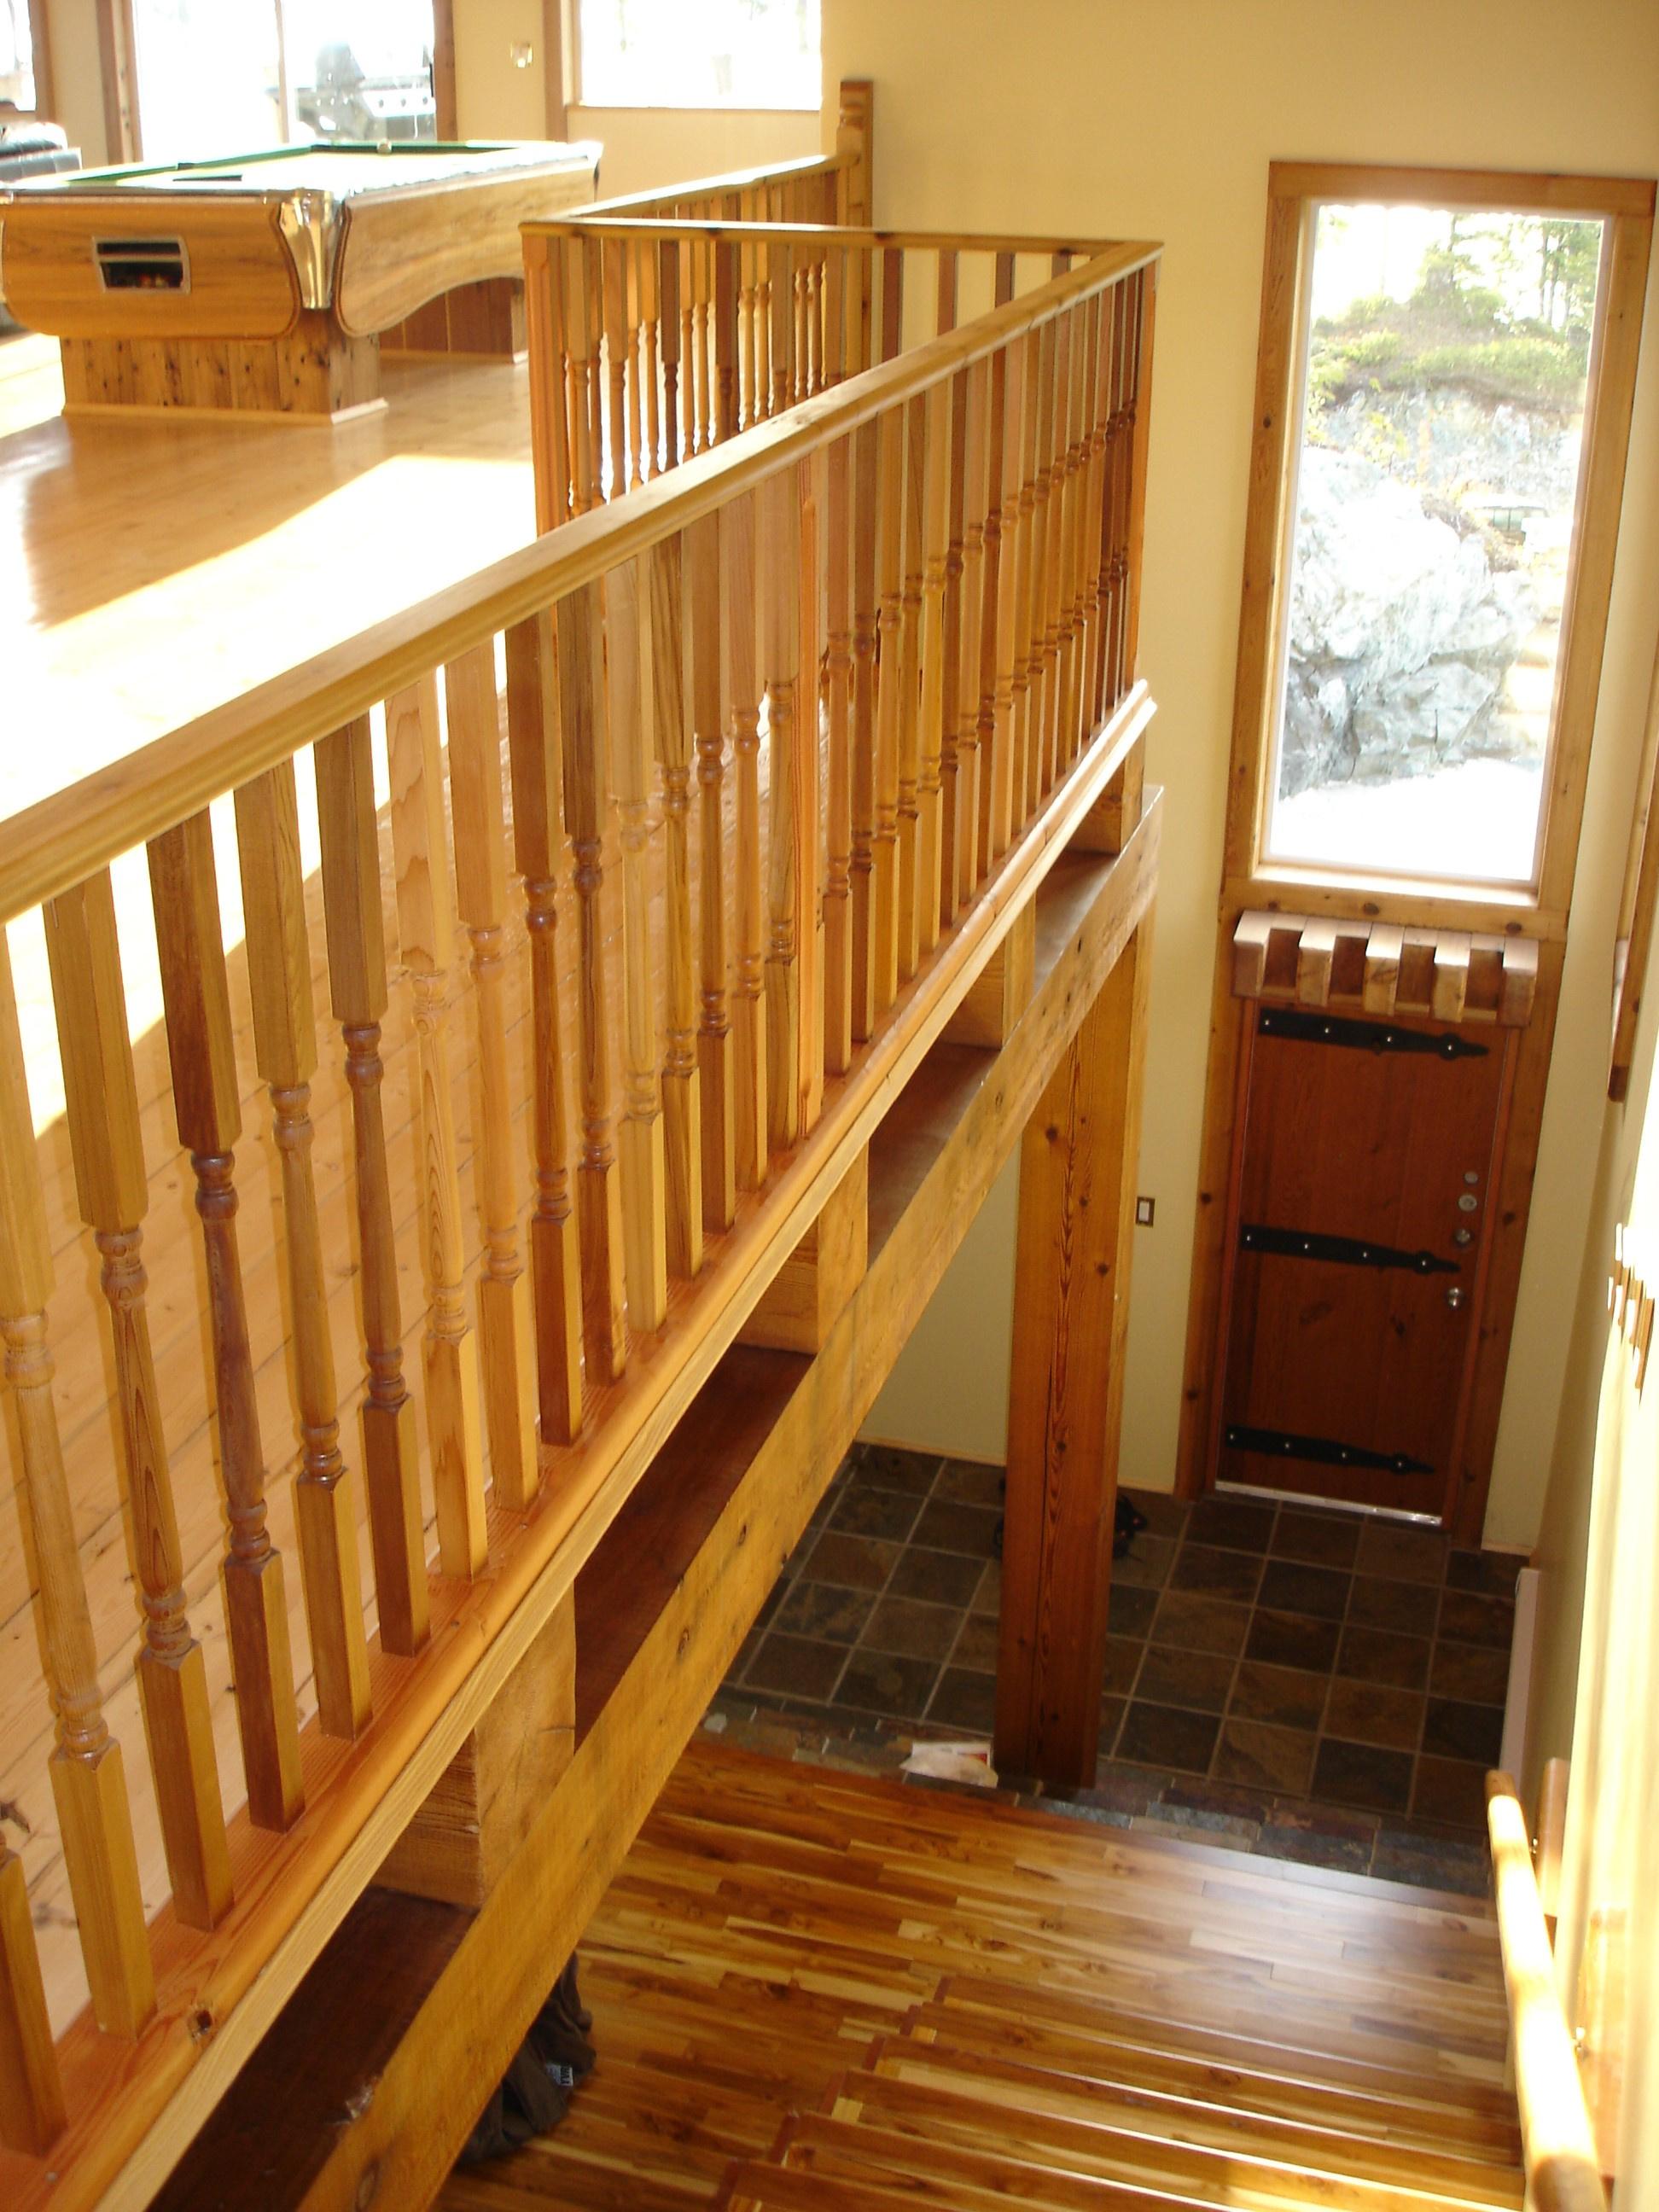 https://0901.nccdn.net/4_2/000/000/056/7dc/stairs-1944x2592.jpg